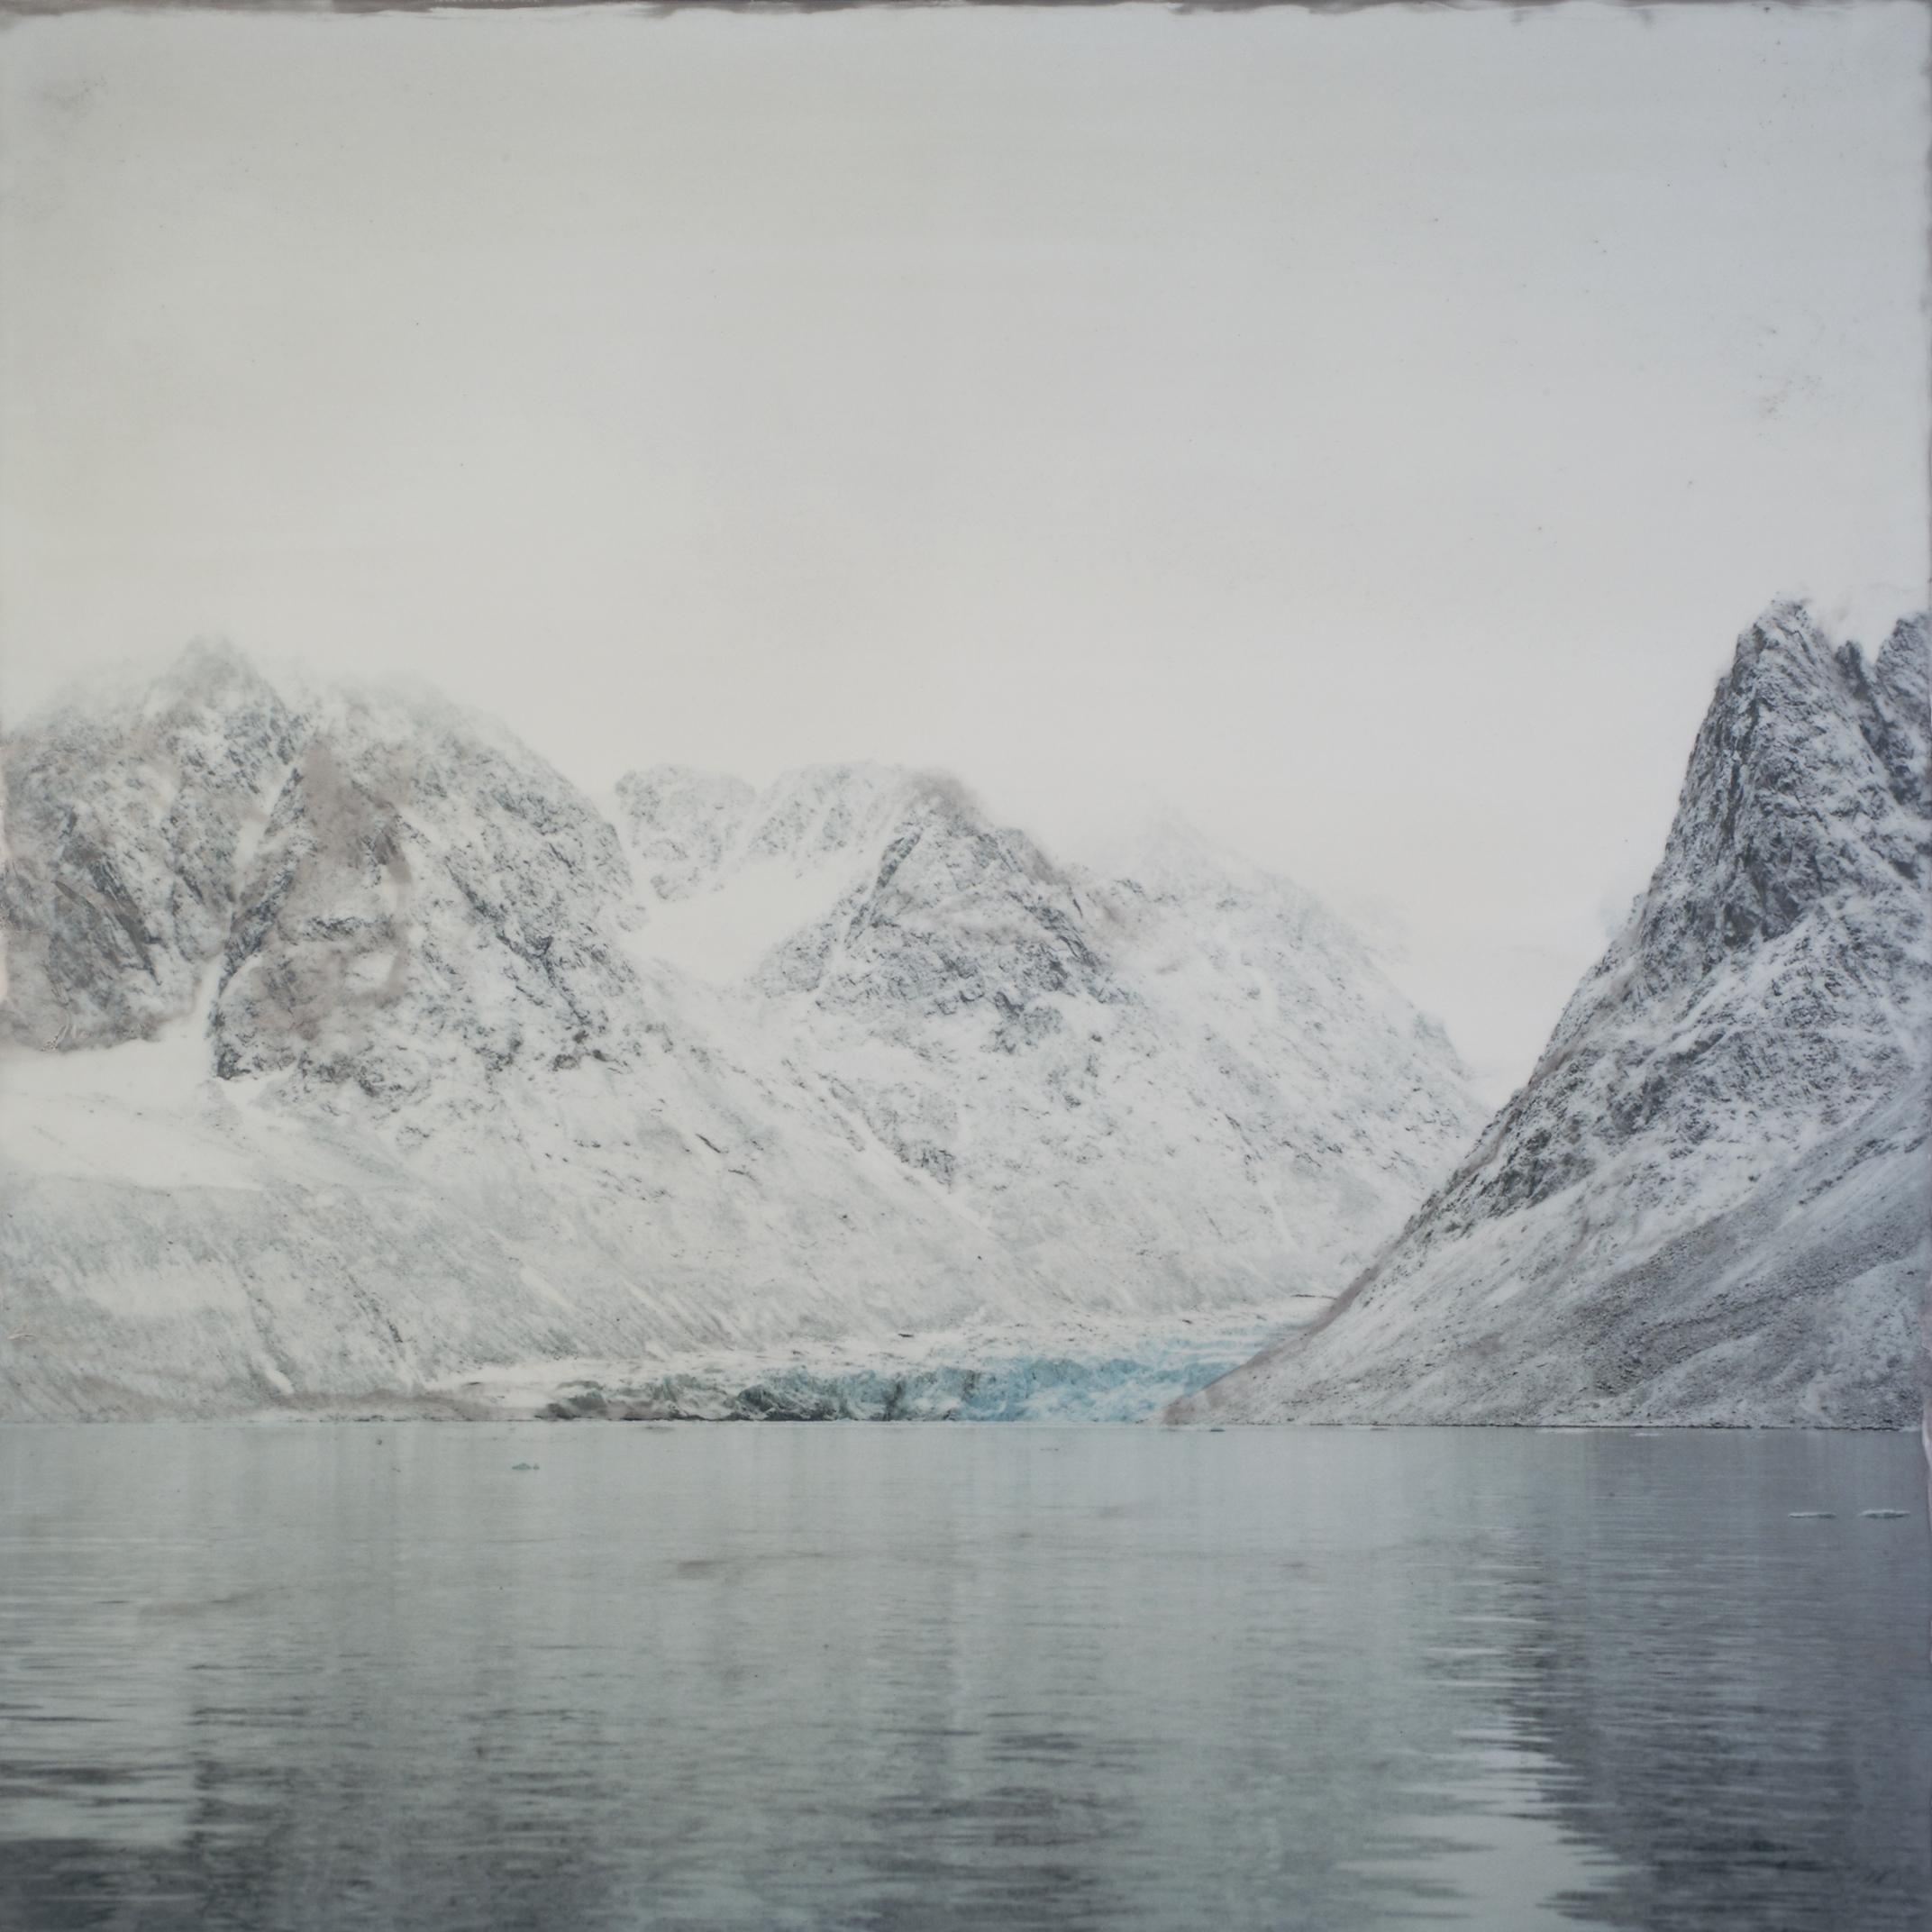 Magadelenafjord Gravneset Glacier